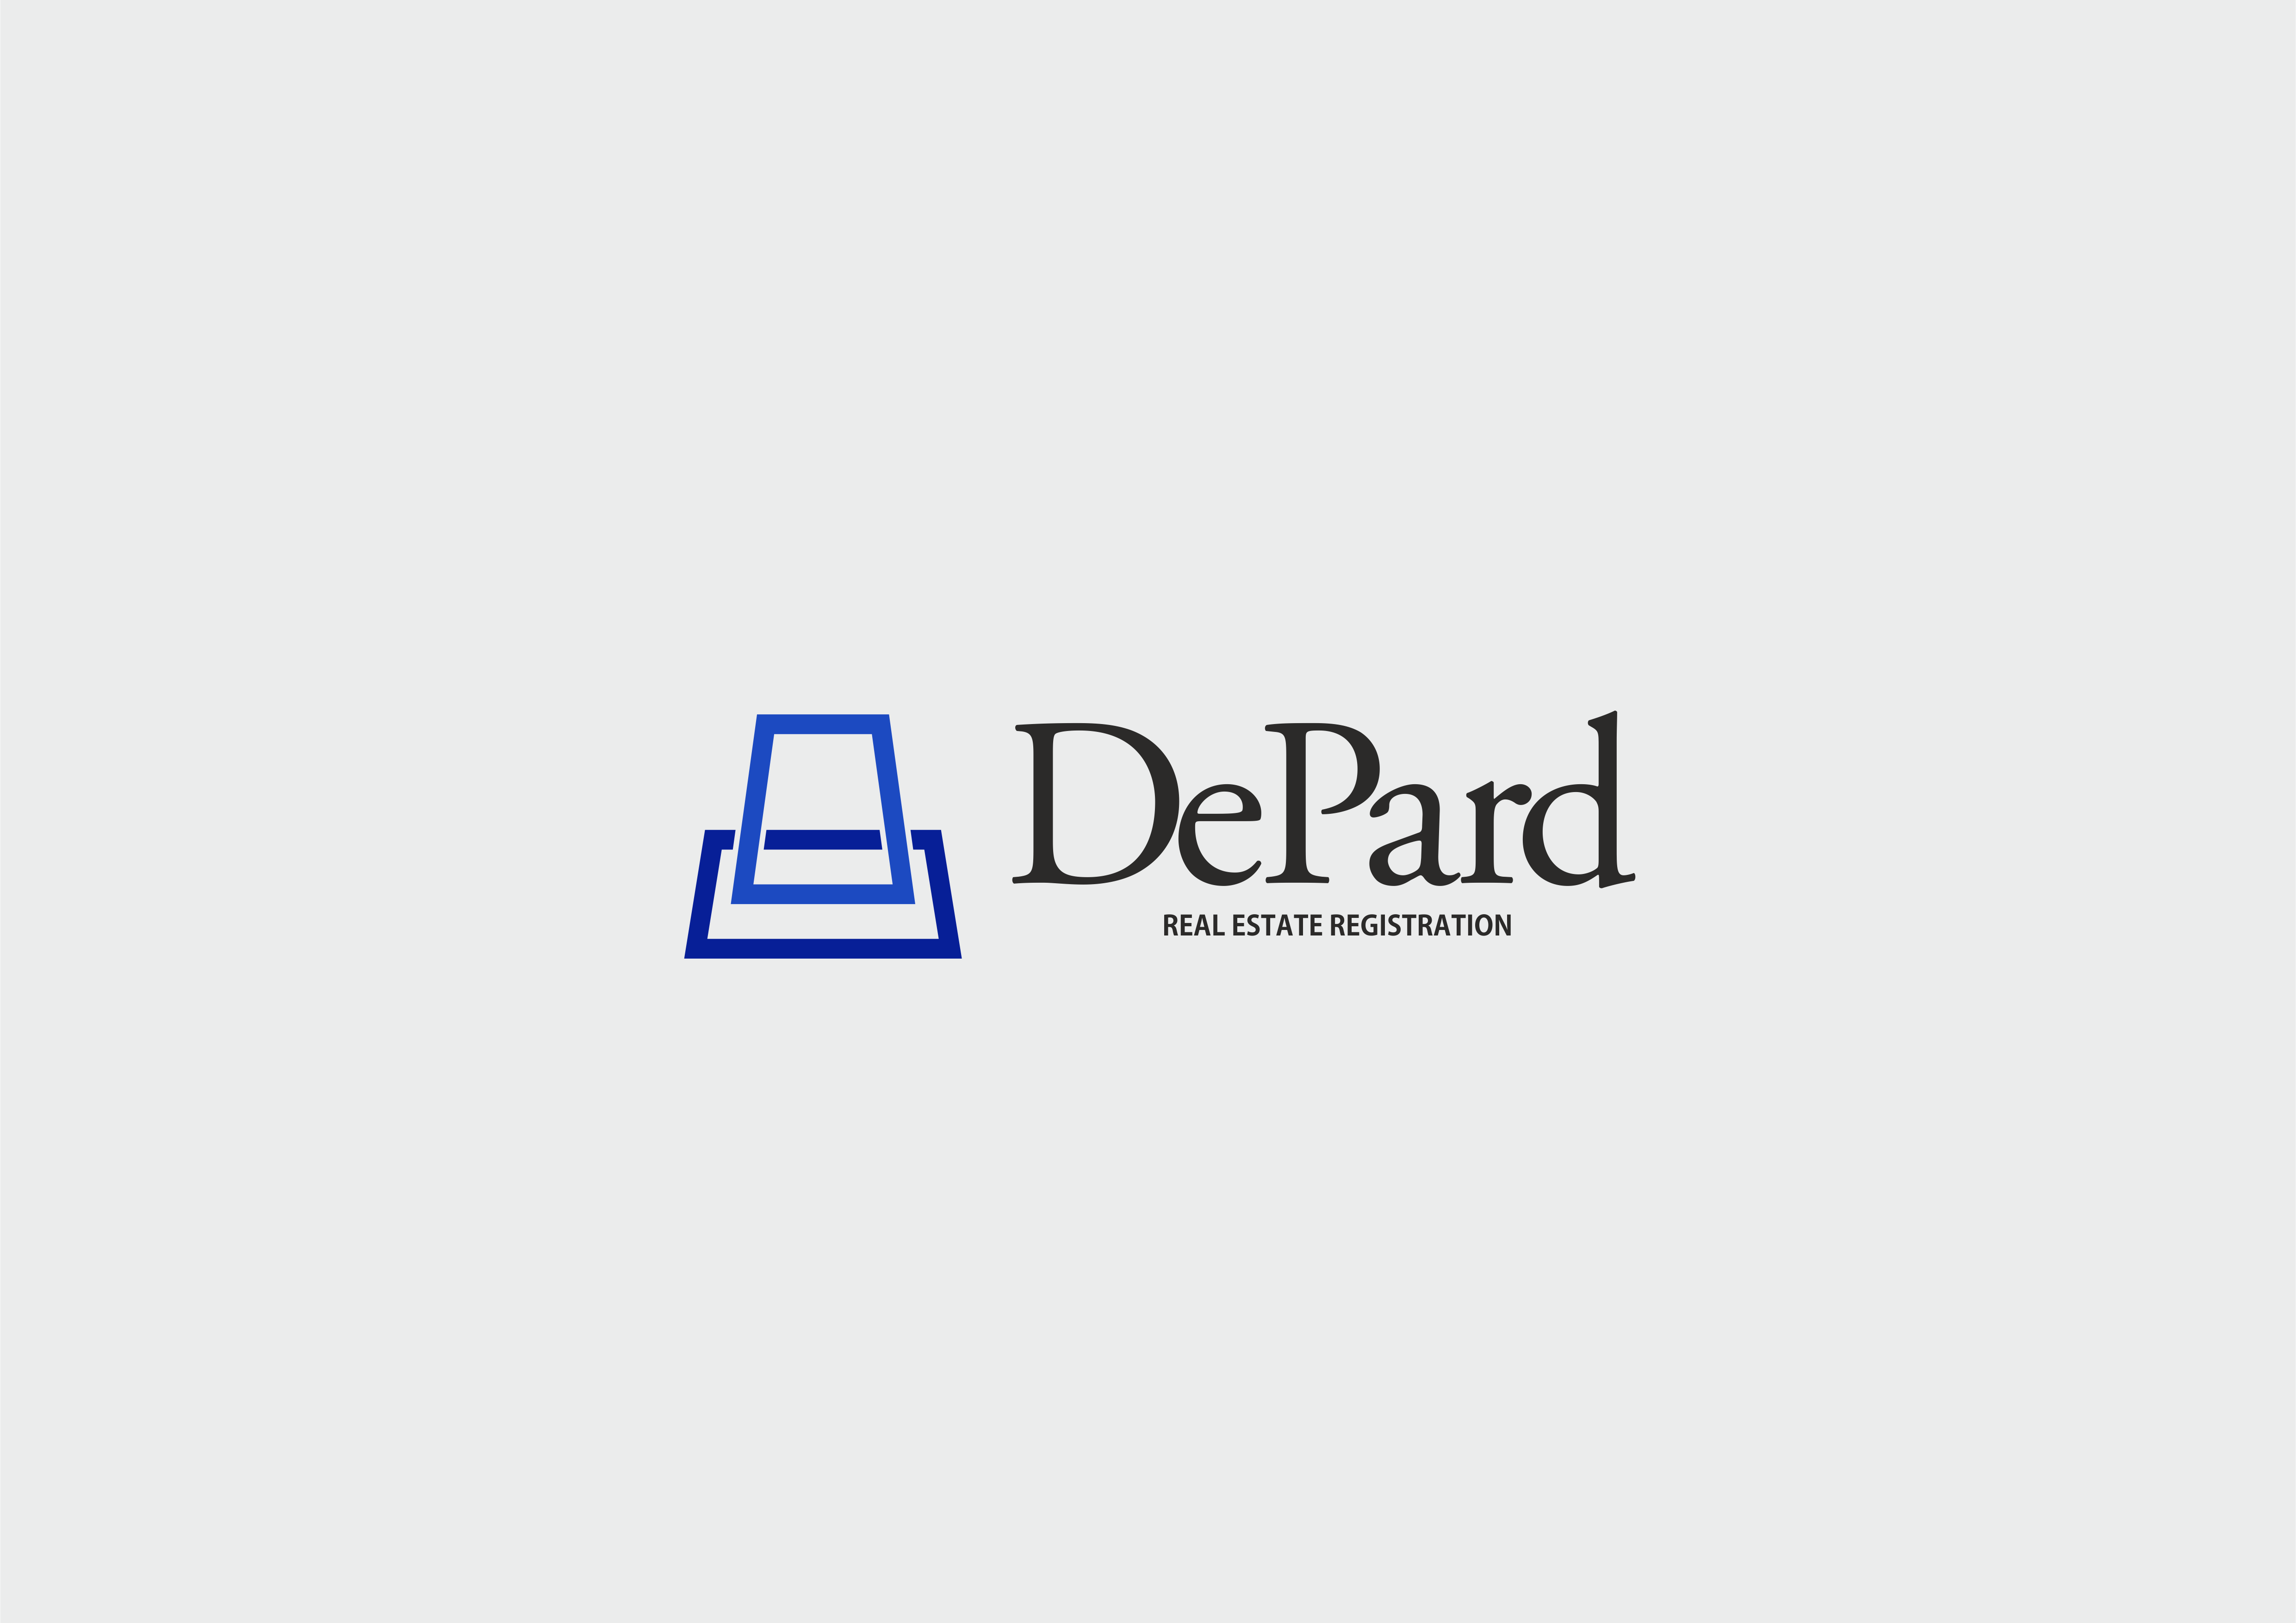 Логотип для компании (услуги недвижимость) фото f_73659352f0edb551.png